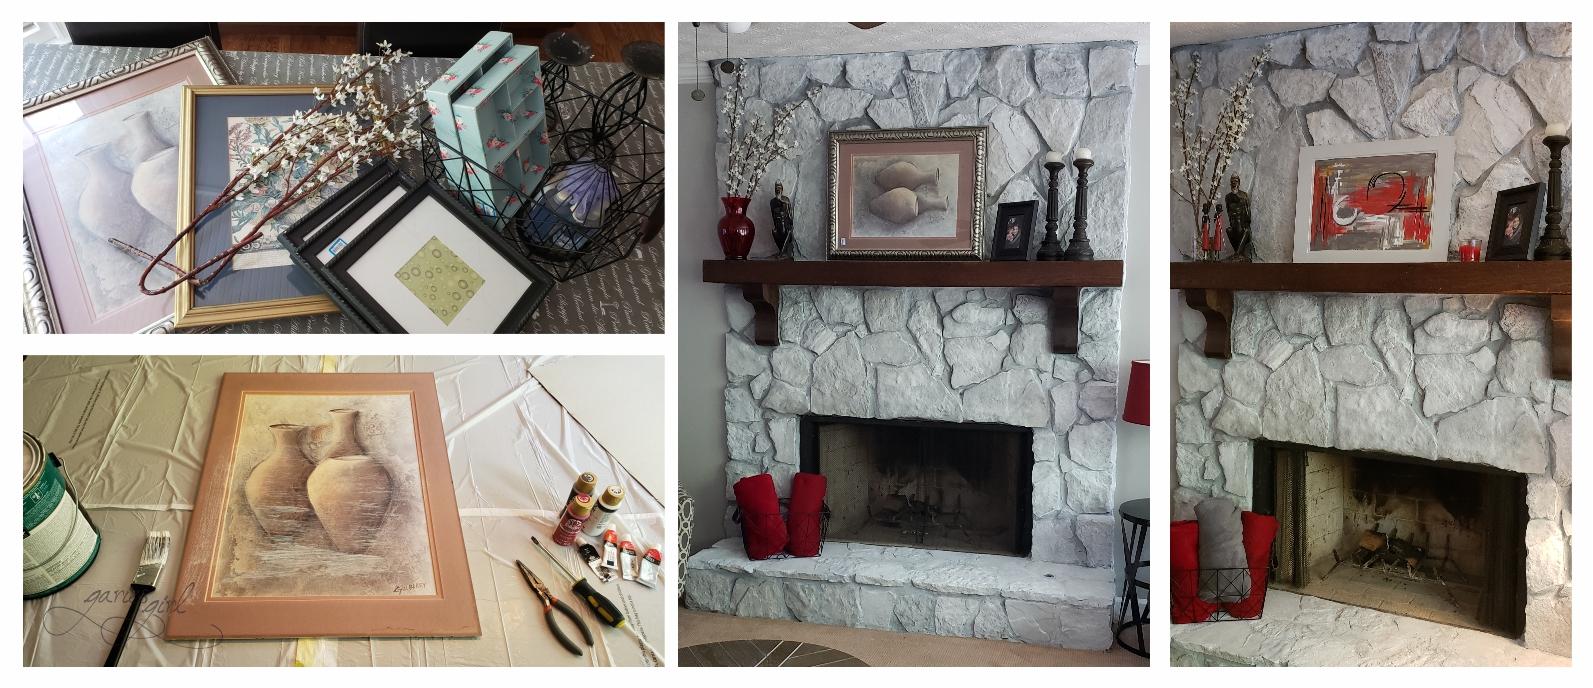 Fireplace Mantel - Artwork